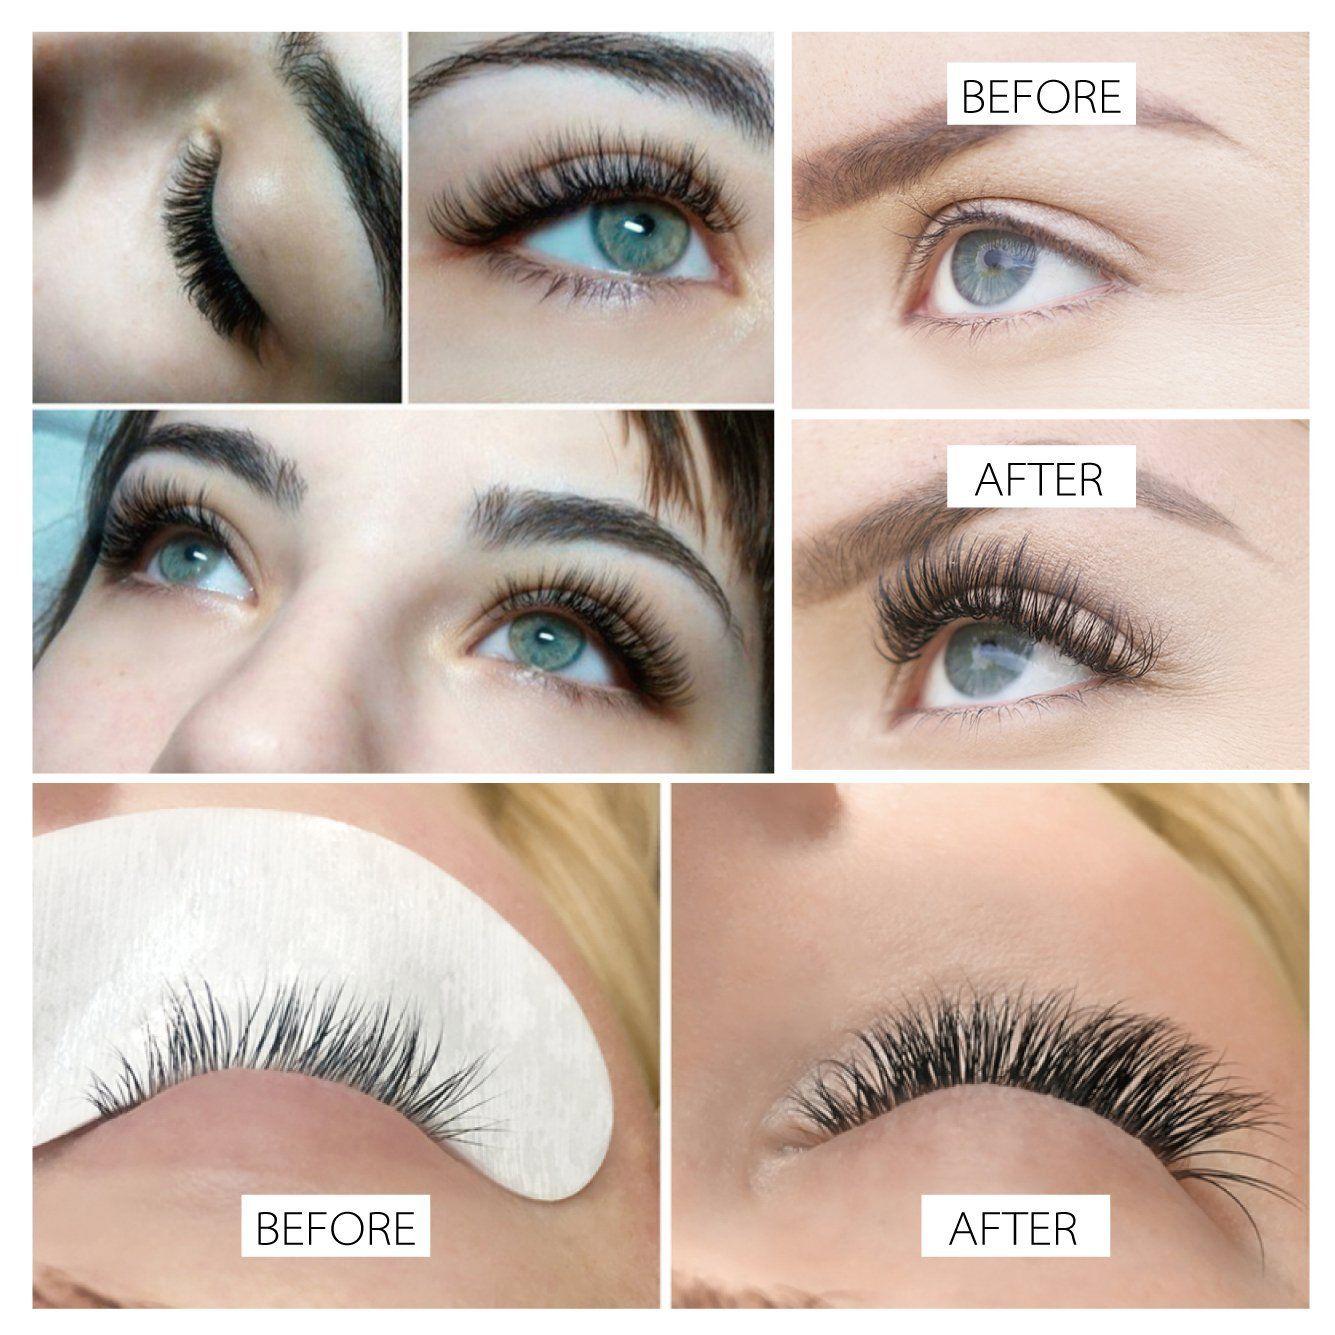 f9627086061 Amazon.com: Beyelian Beauty Mink Eyelash Extensions Charming D Curl 0.20mm  Mixed Tray